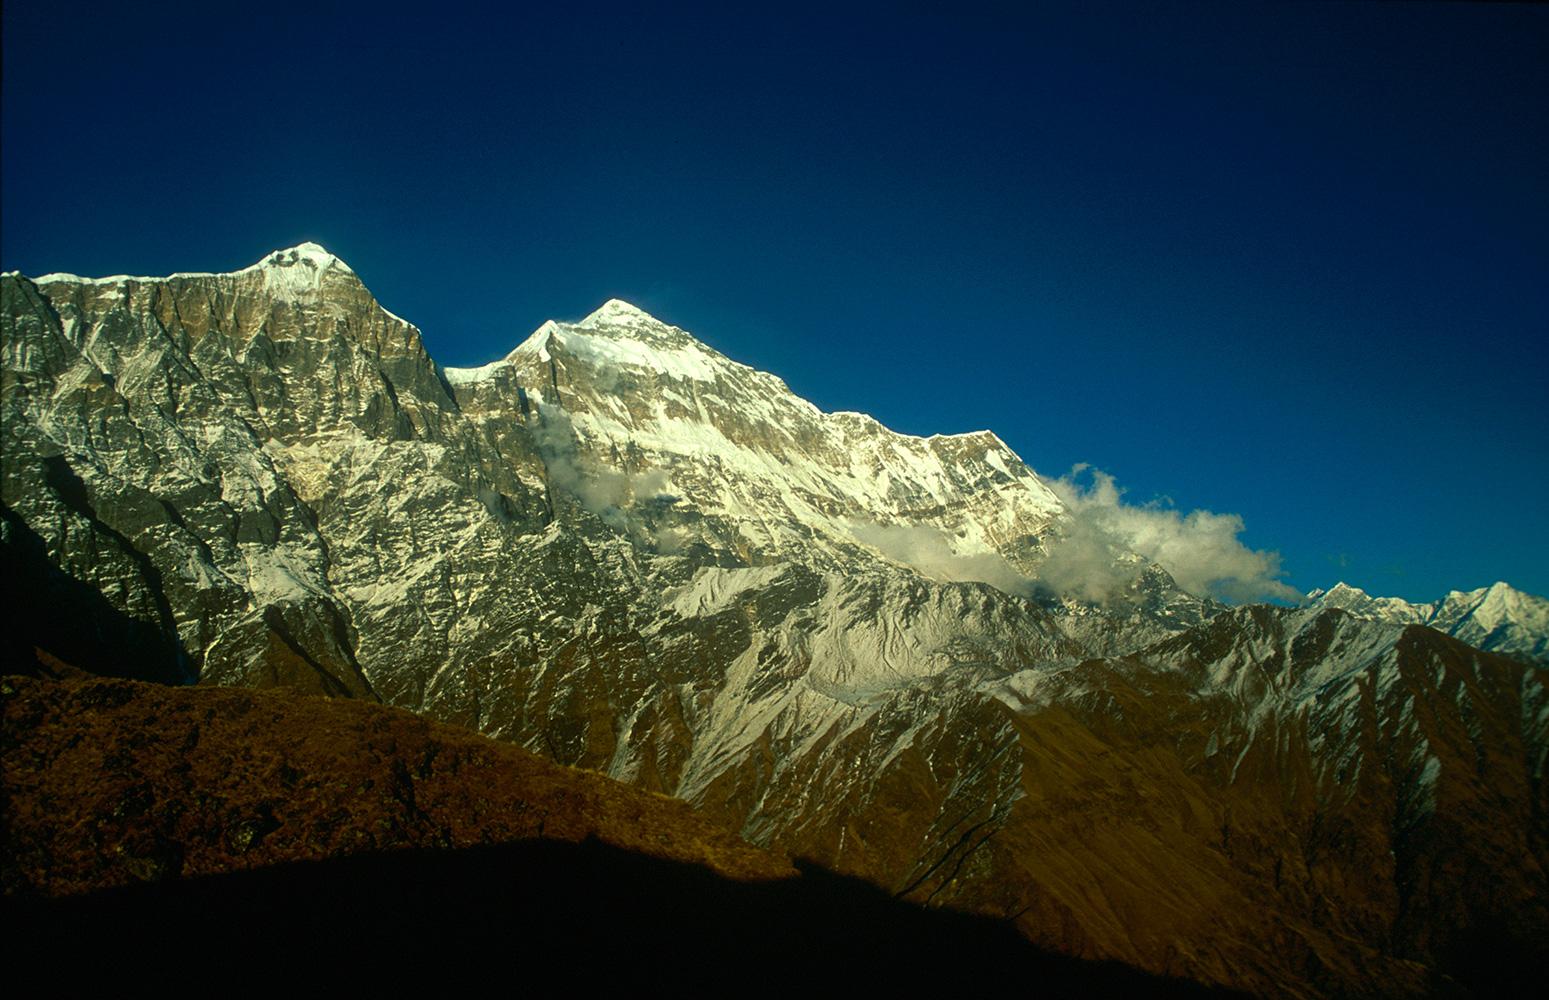 Evening light on Ghustung (6529m) and Gurja from Budzunge Bara (4590m).Nikon FM2, 24mm, Fuji Velvia